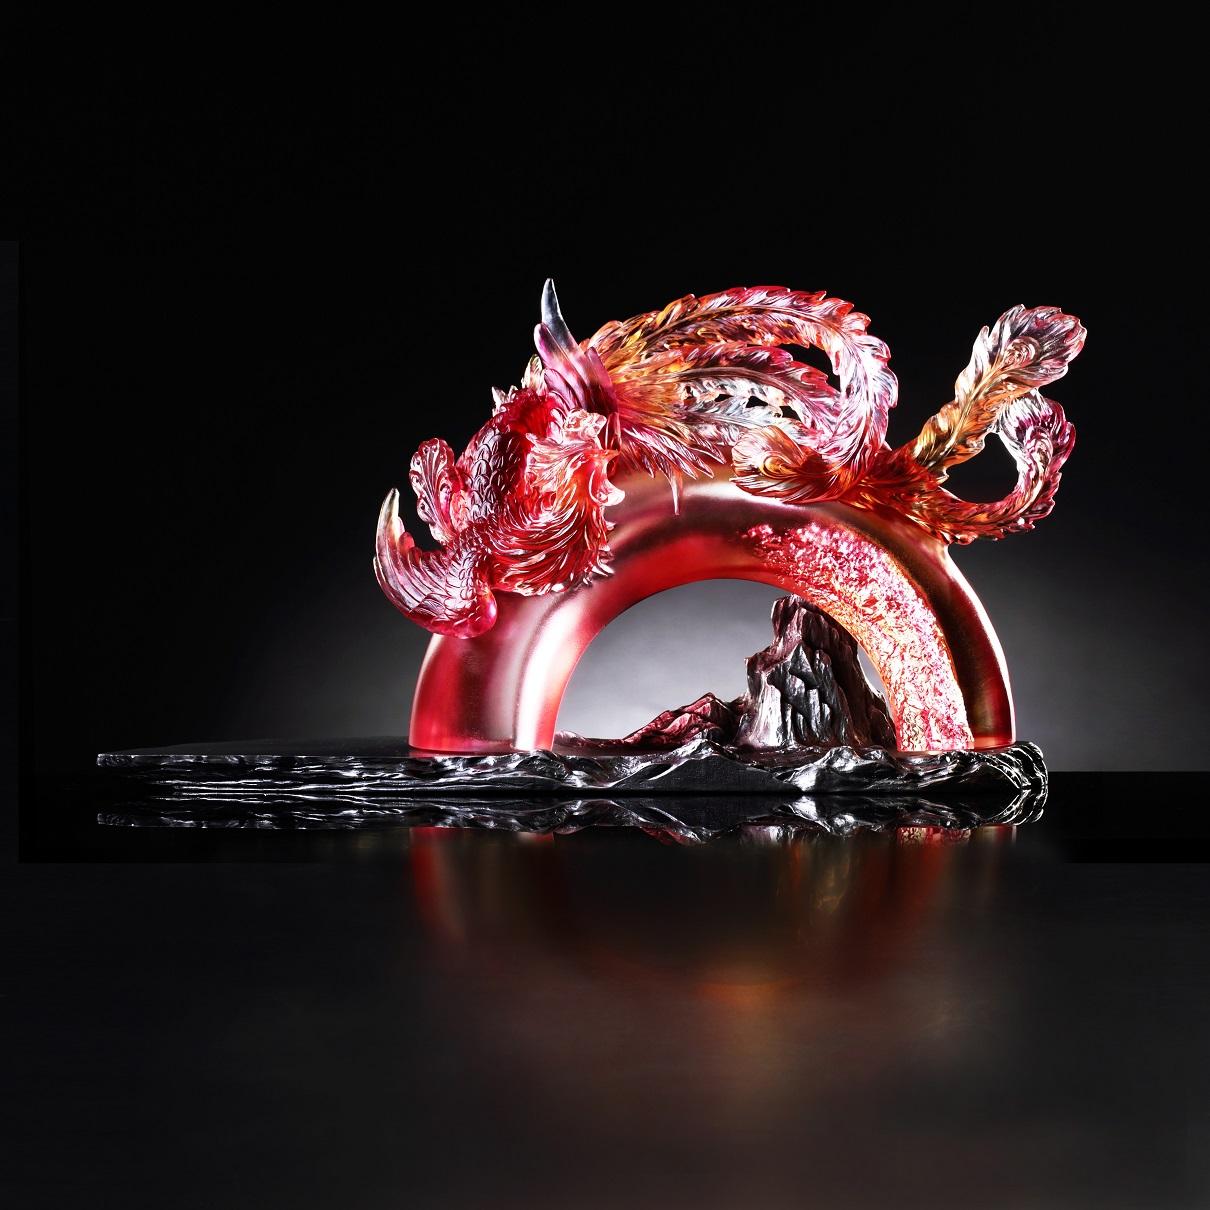 the-phoenix-glass-phoenix-figurine-on-pewter-basereduced